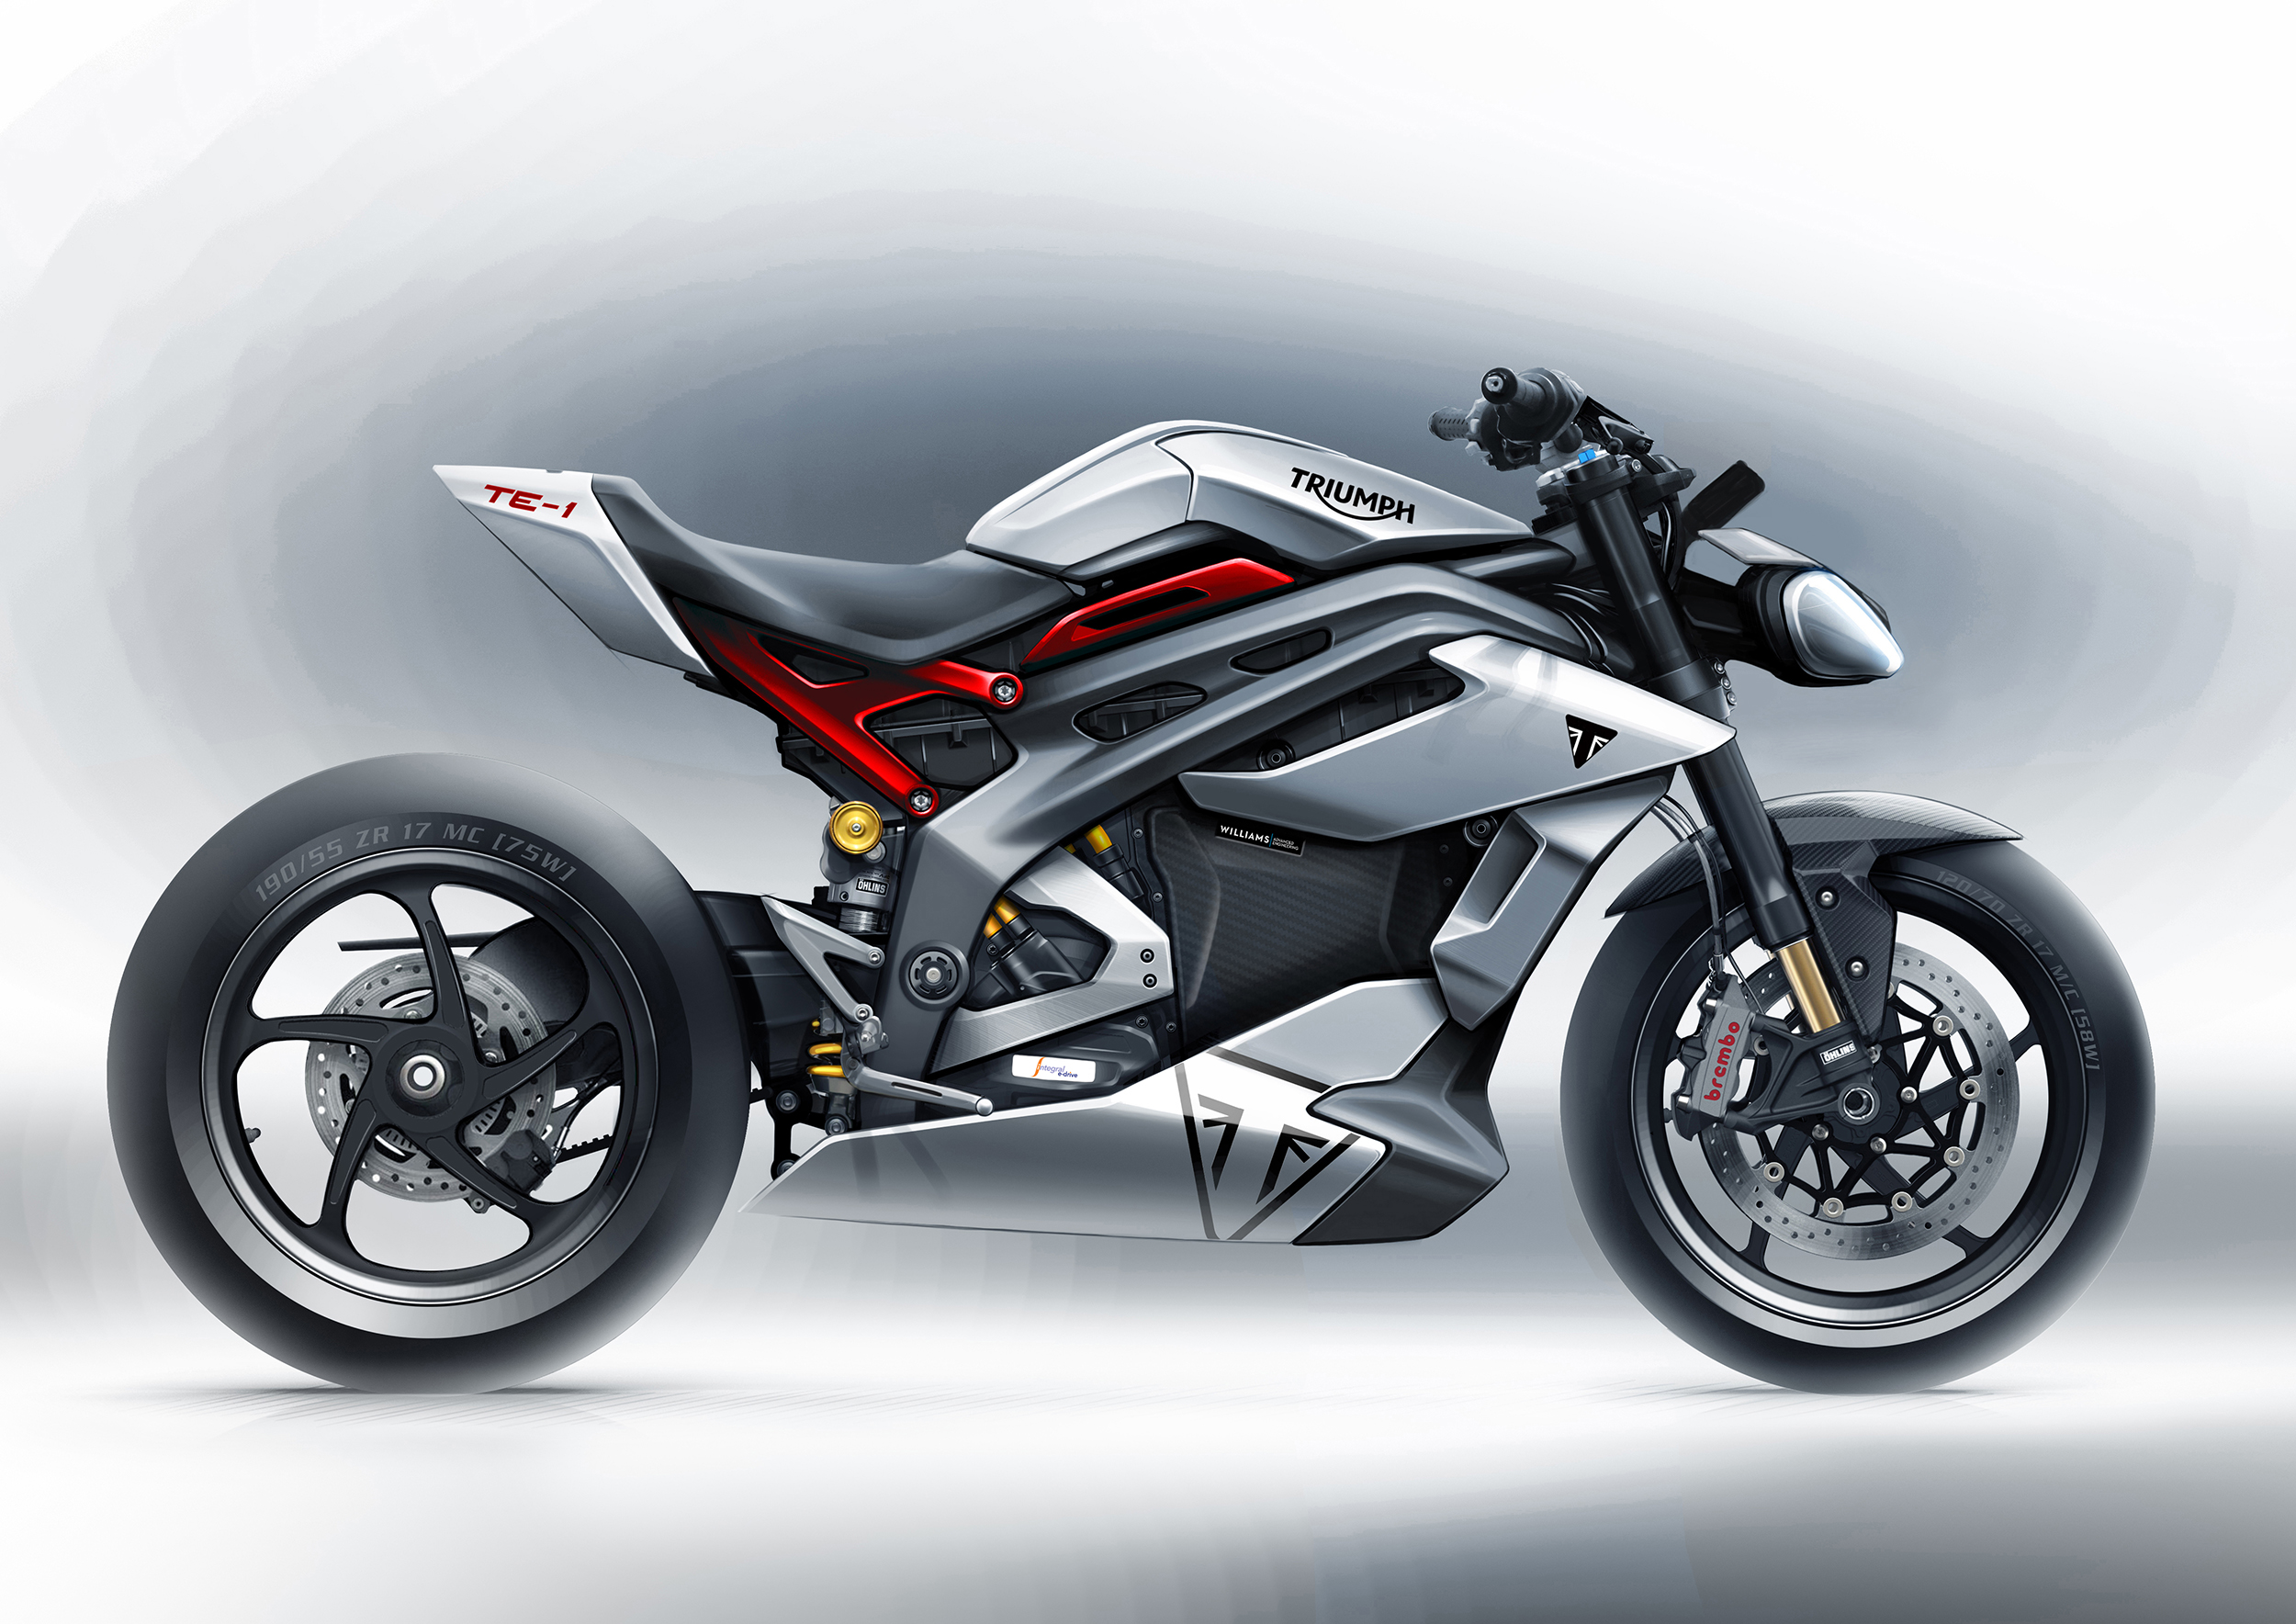 210325 Triumph Motorcycles TE-1 Prototype Sketch